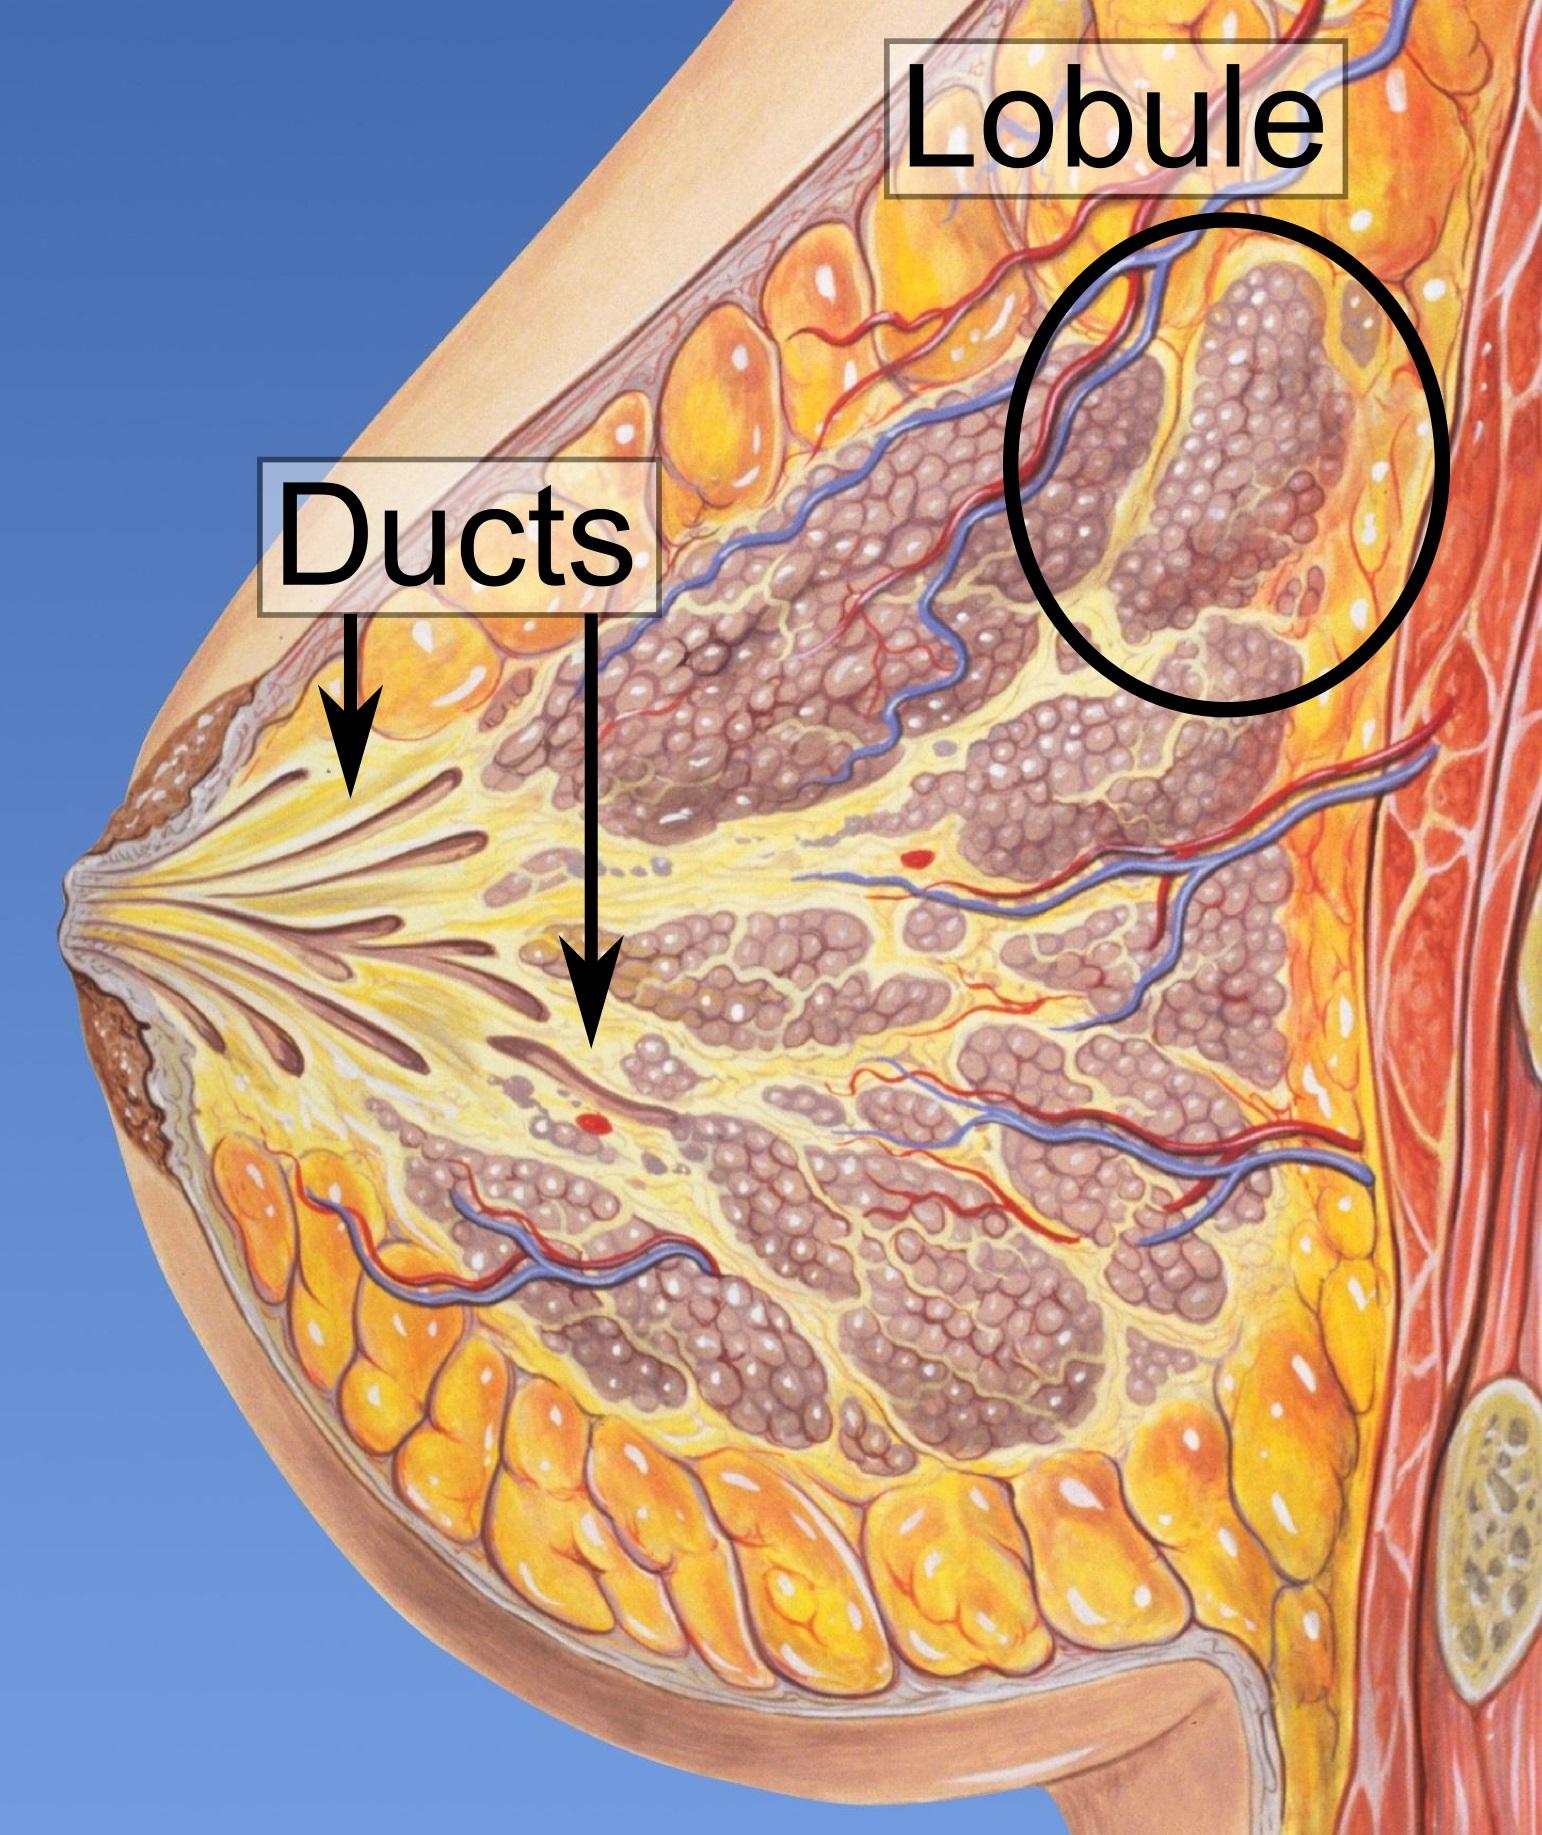 papilloma urdu mean warts on hands medicine